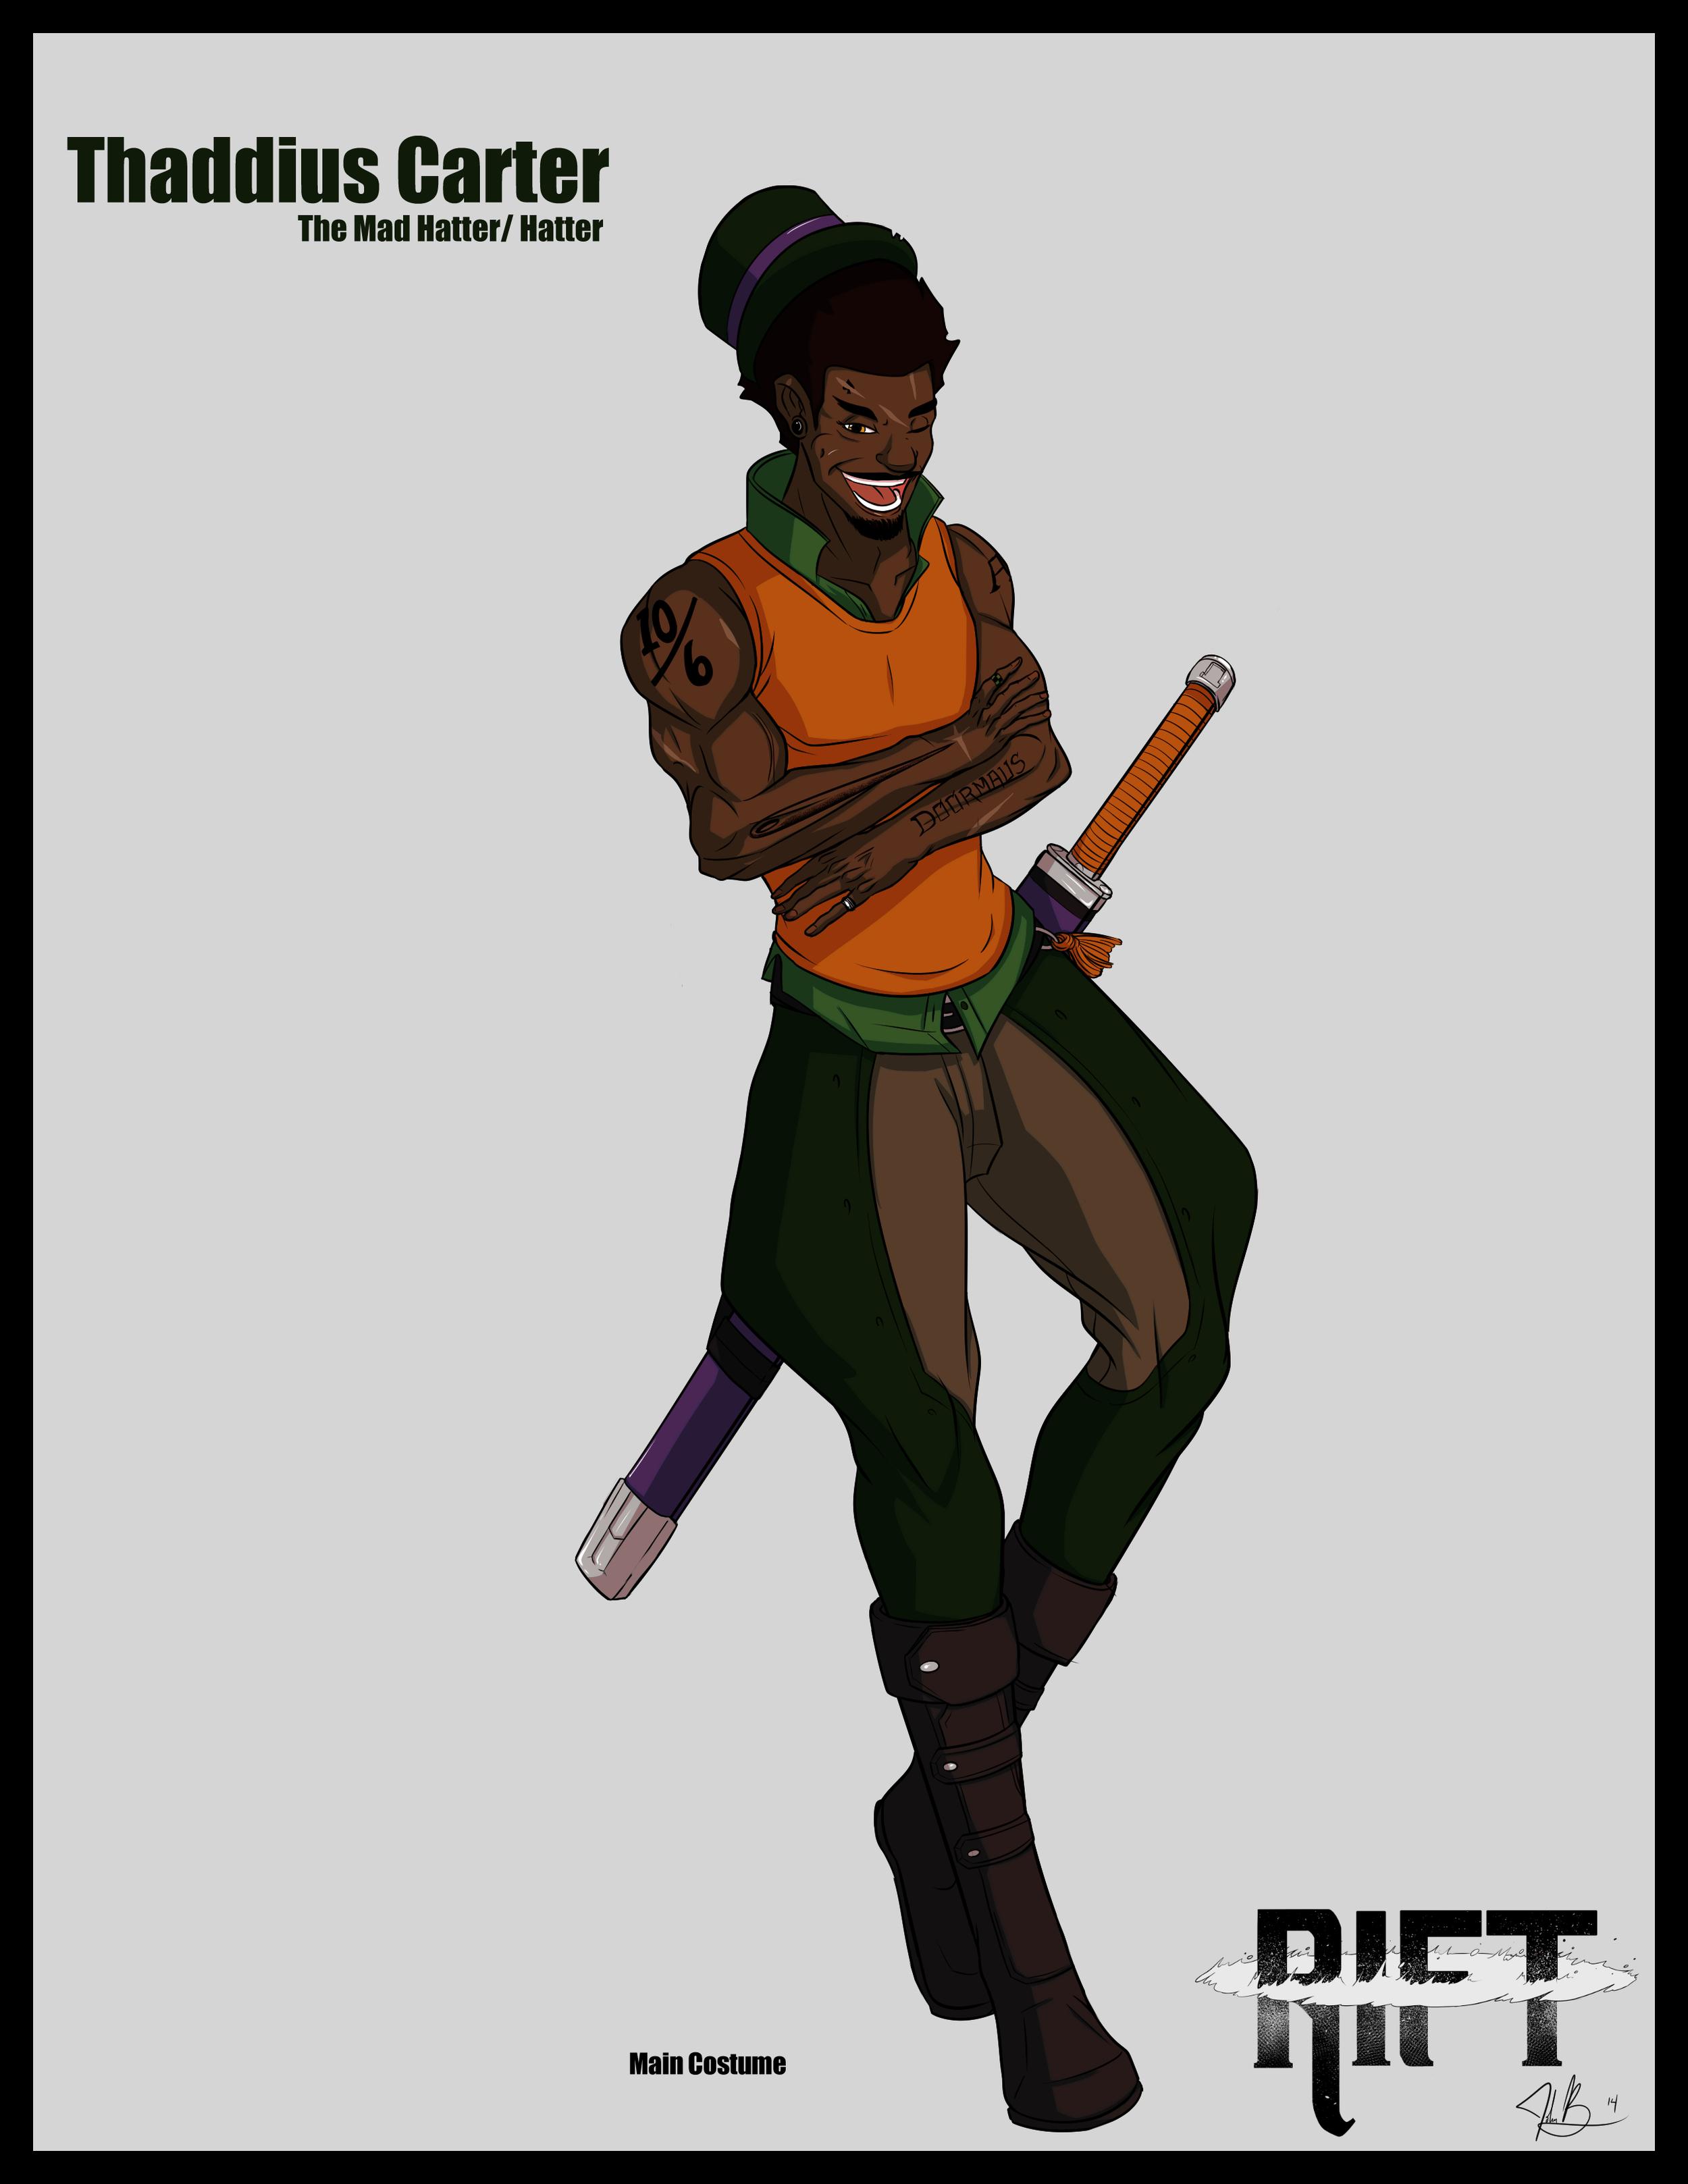 RIFT - Thaddius Carter the Mad Hatter